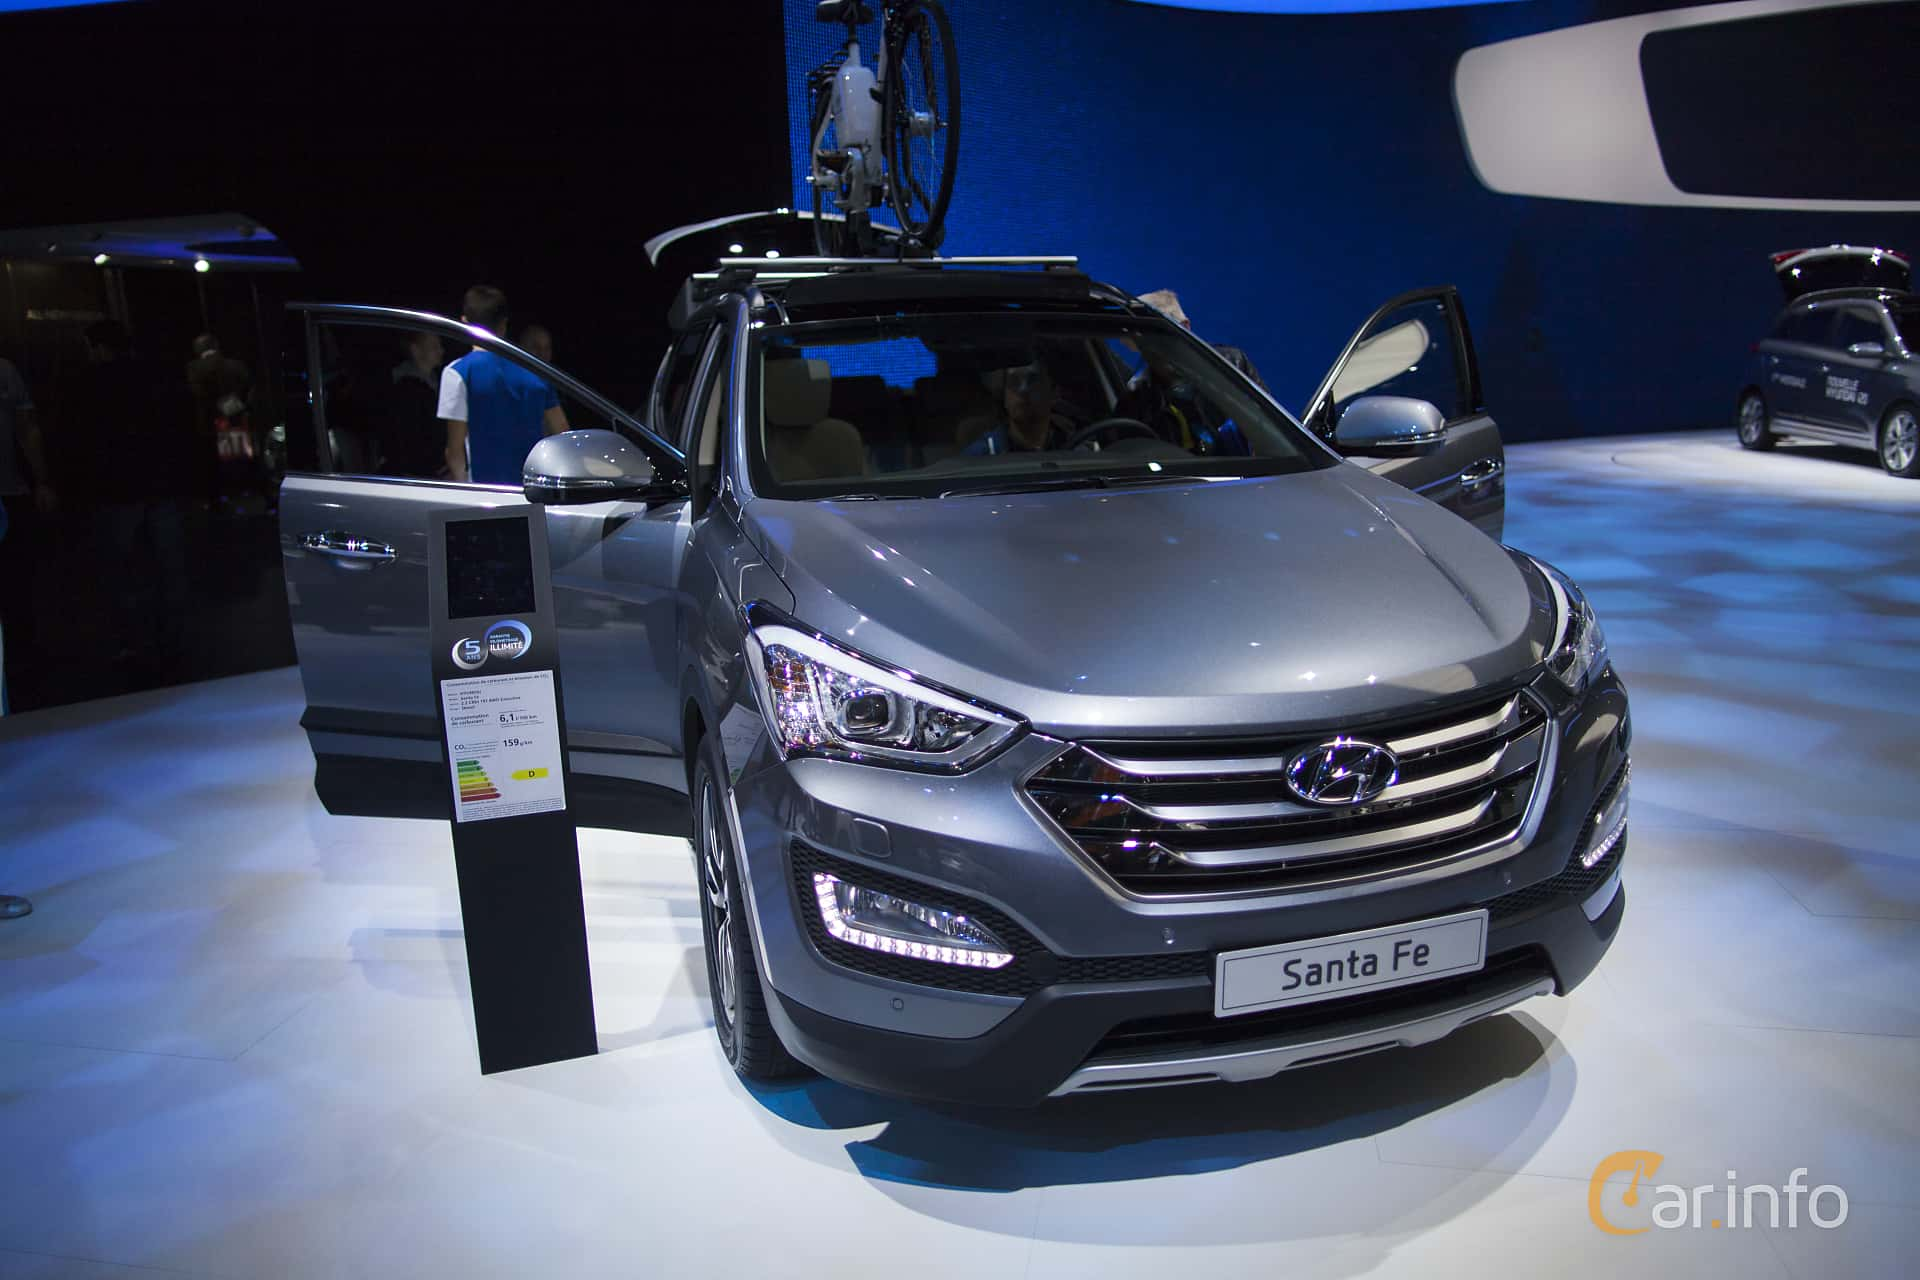 Hyundai Santa Fe 2.2 CRDi 4WD Manual, 200hp, 2015 at Paris Motor Show 2014